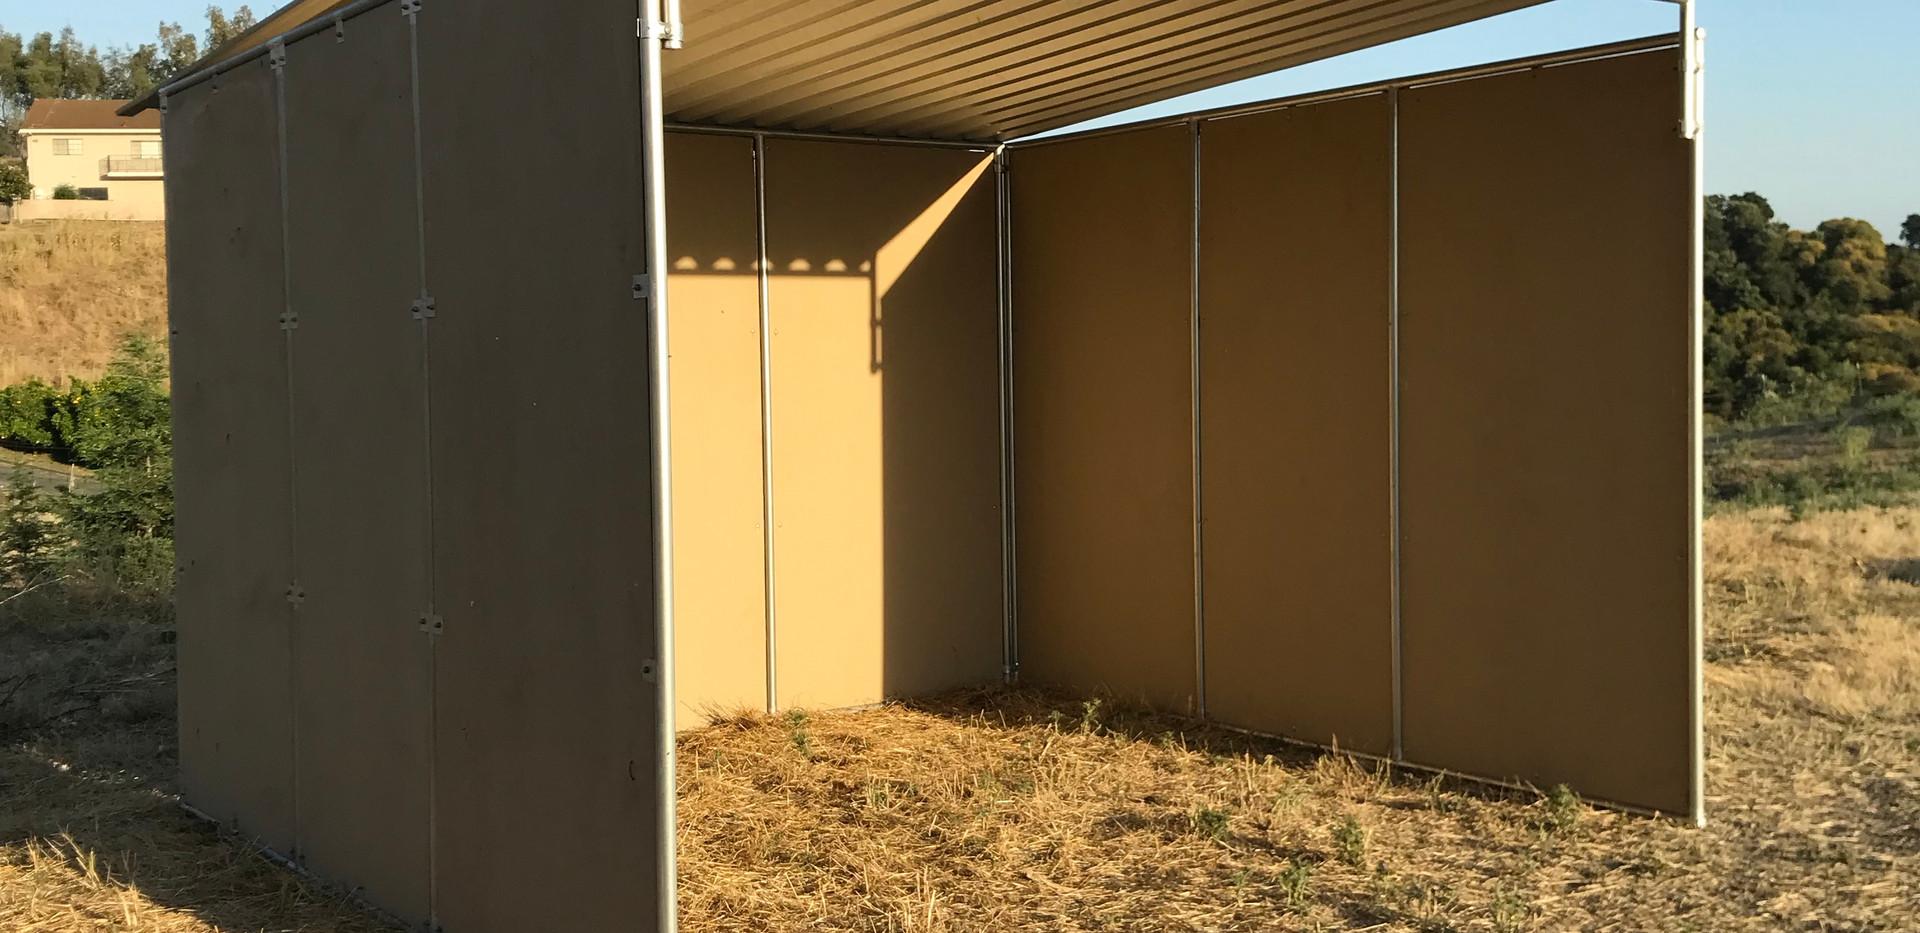 3 Sided Shelter Photo 1.jpg